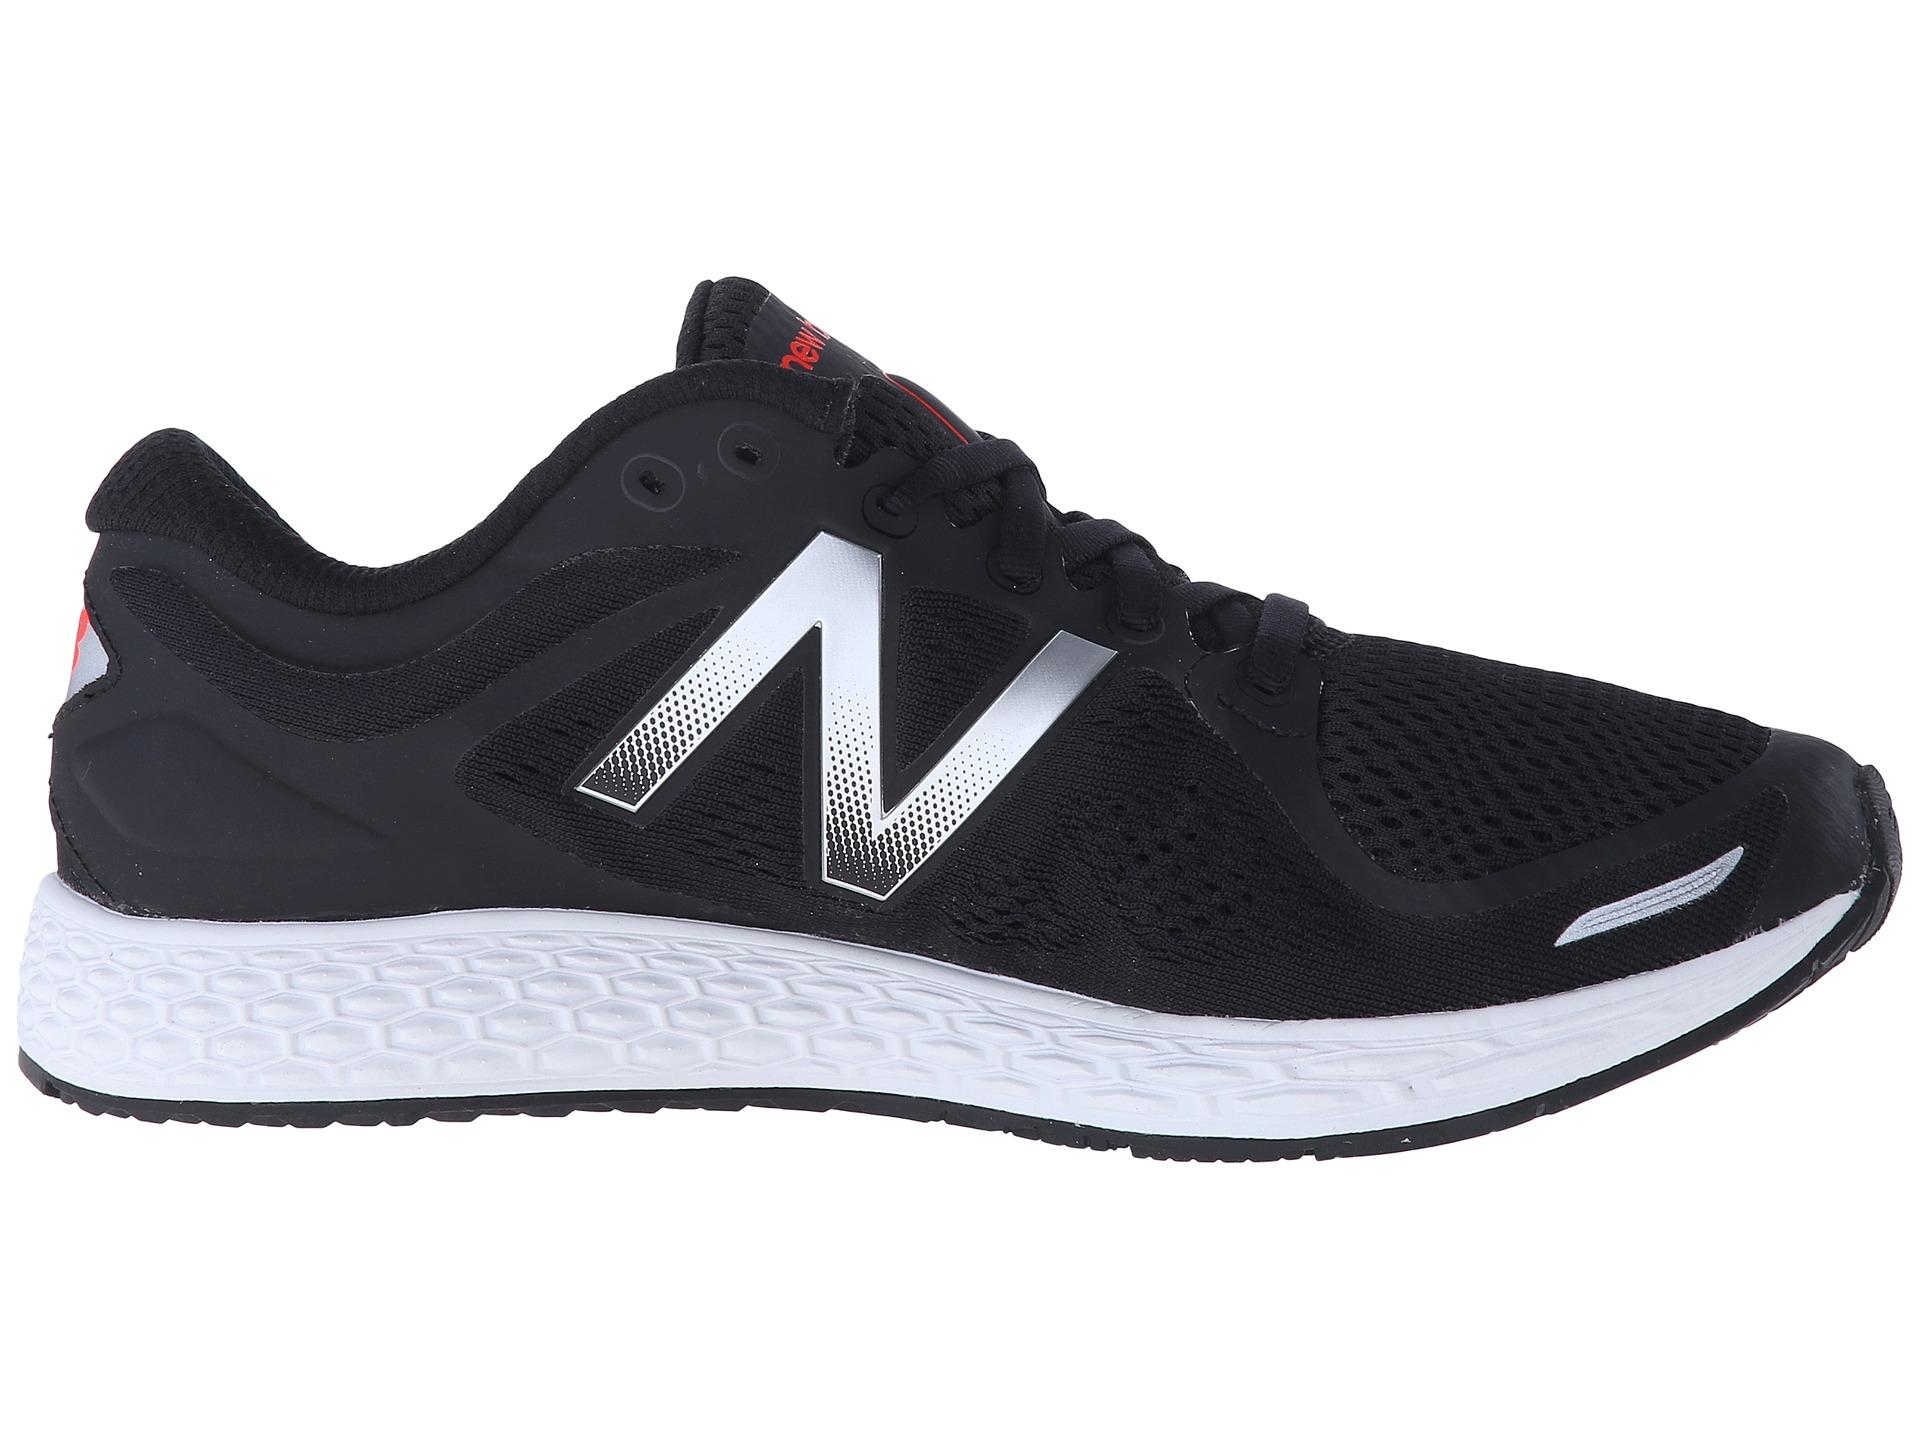 New Balance Best Cushioning Running Shoe